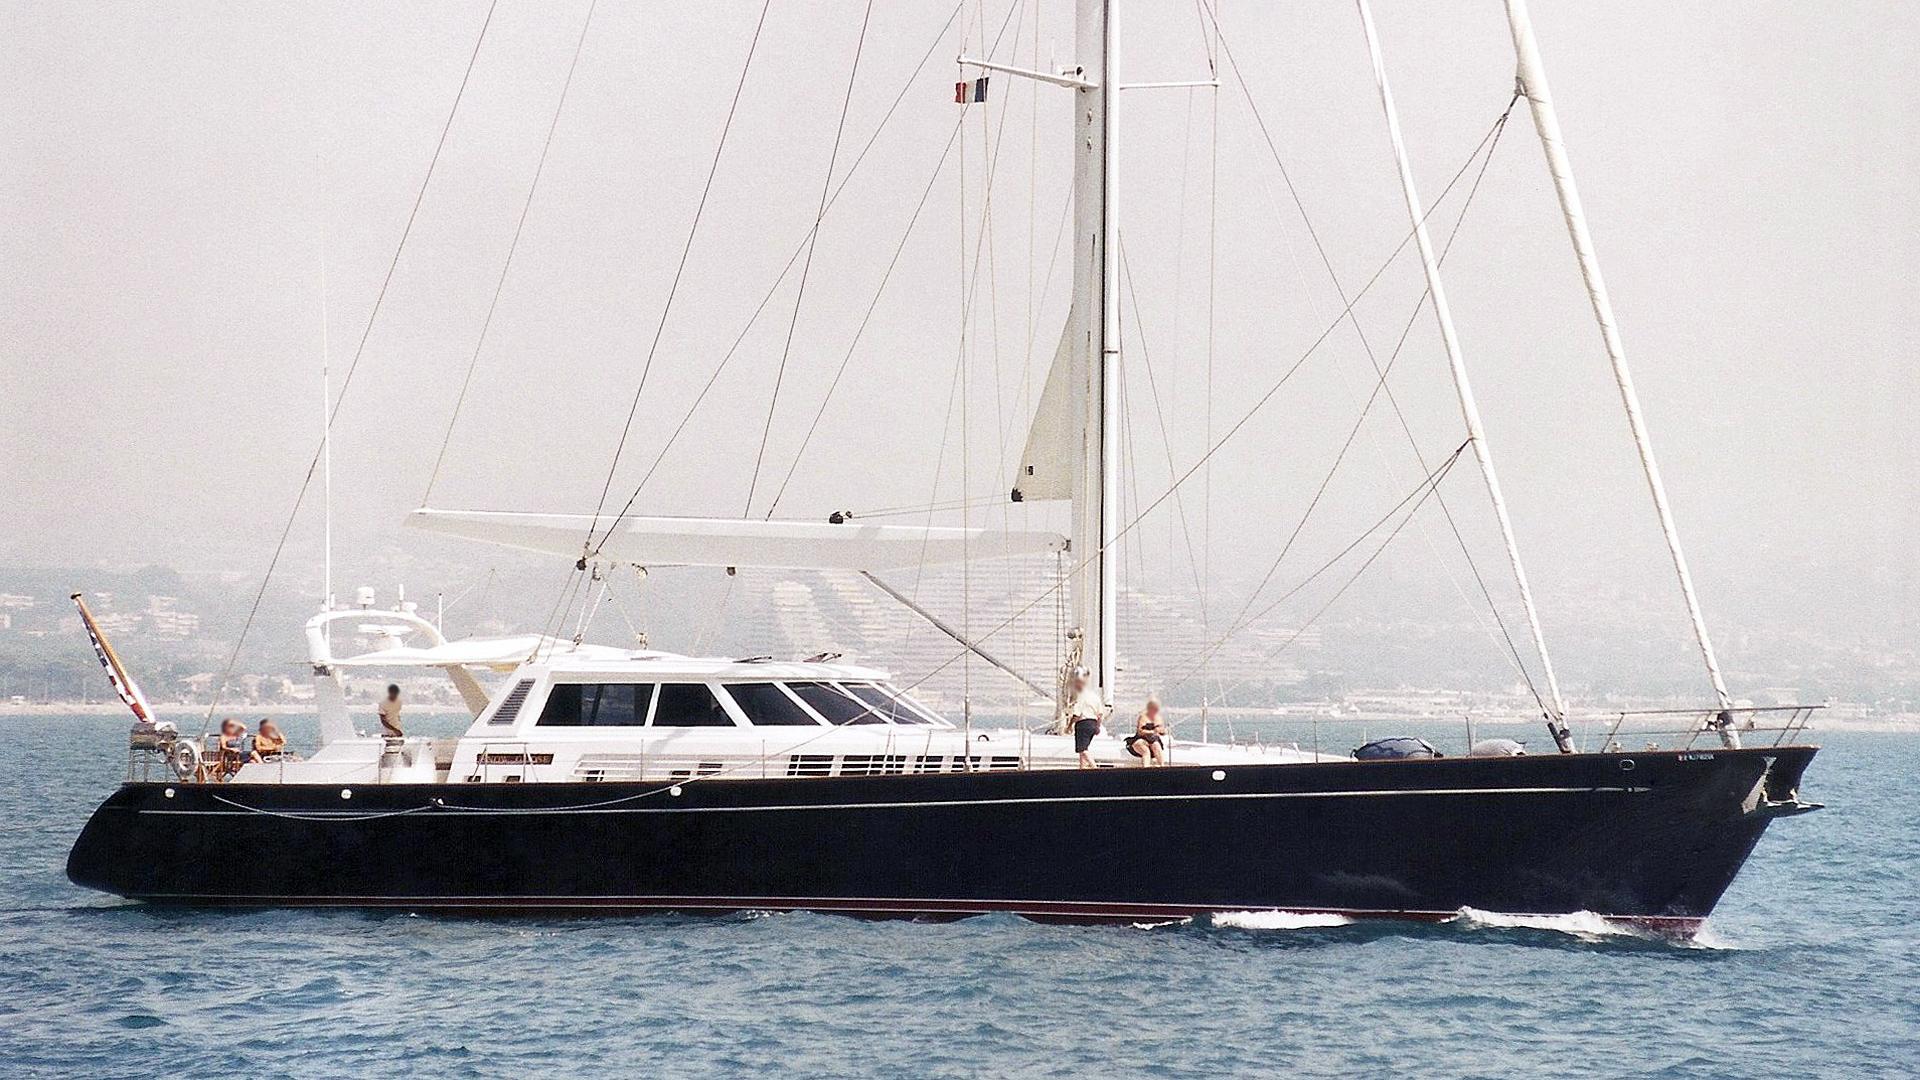 snowgoose-ii-sailing-yacht-insark-marine-us-1993-35m-running